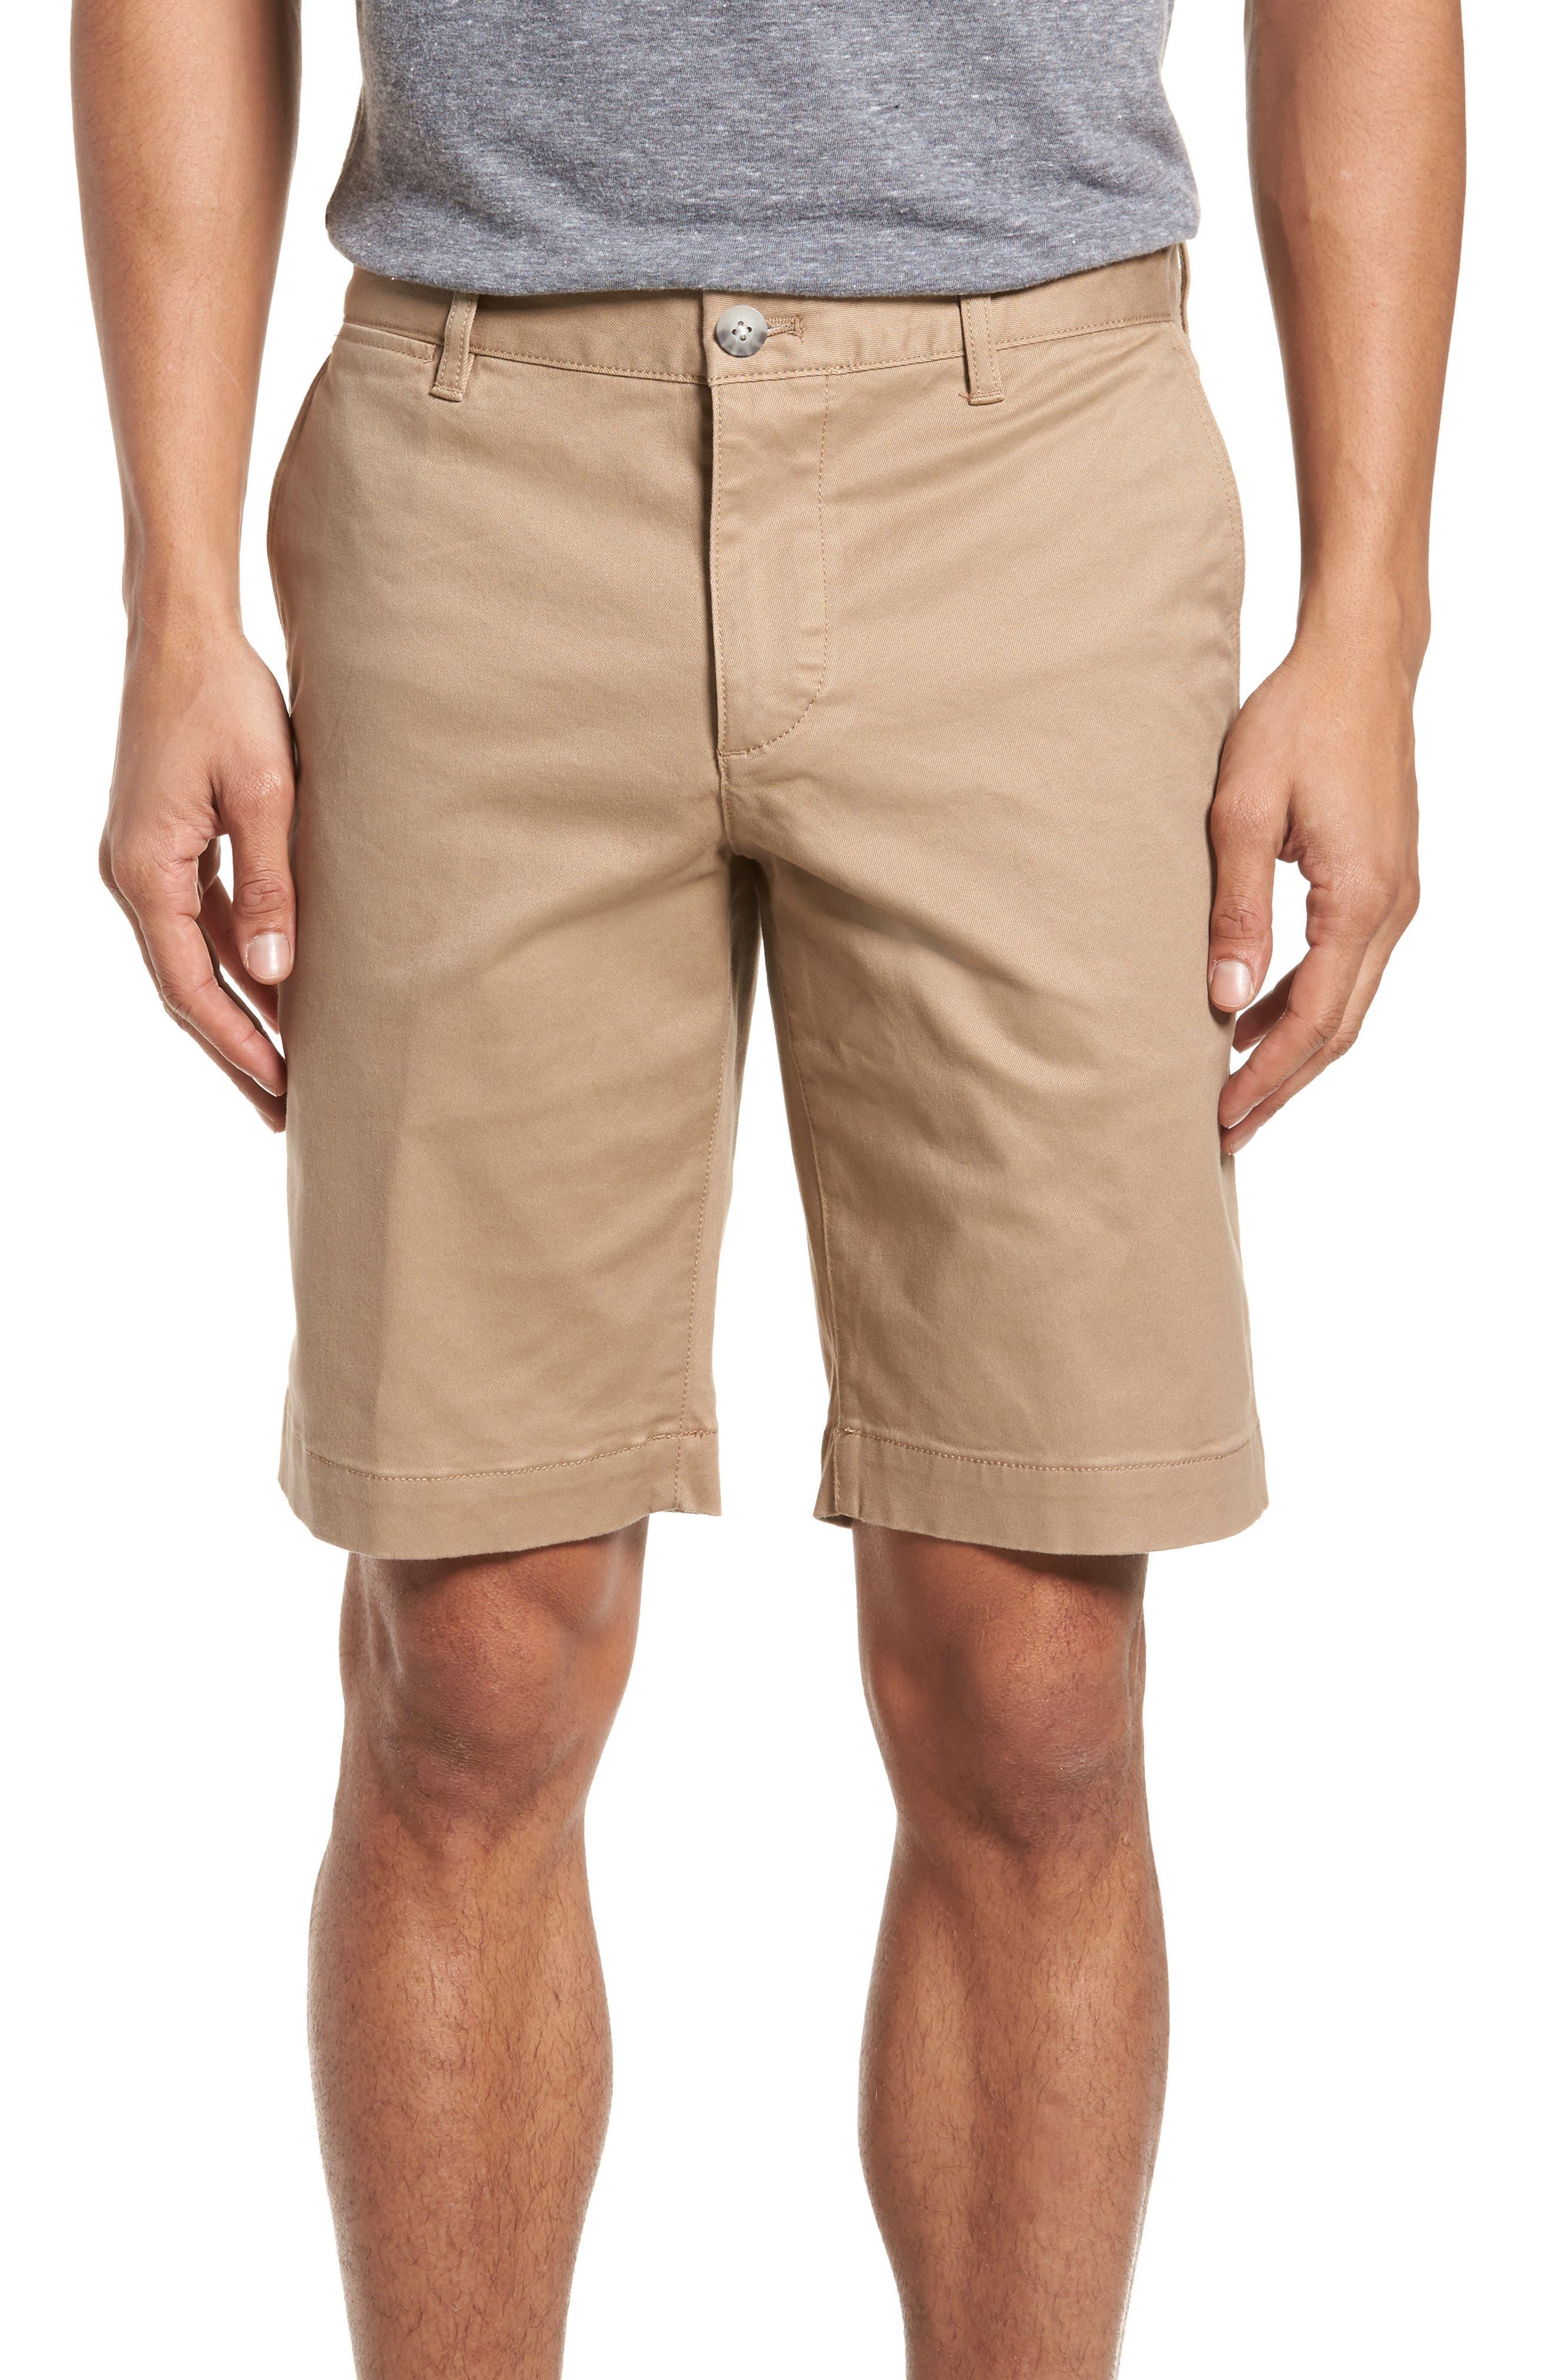 Slim Fit Chino Shorts,                             Main thumbnail 1, color,                             Kraft Beige